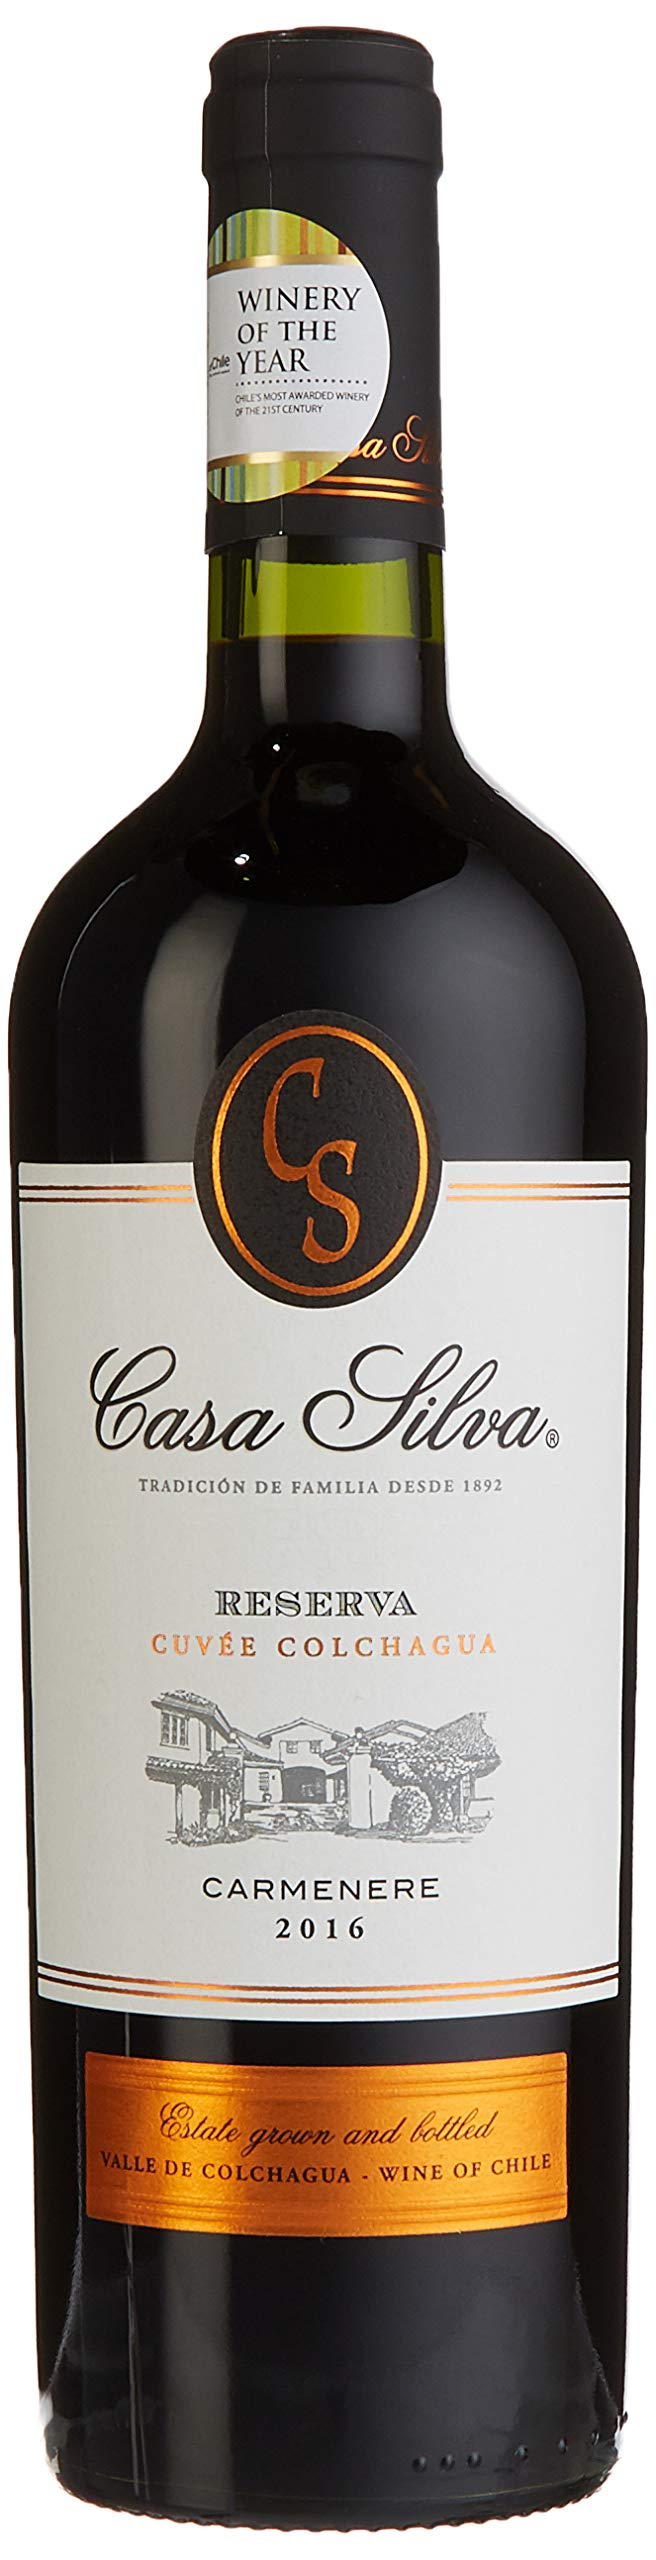 Casa-Silva-Carmnre-Reserva-Cuve-Colchagua-2016-trocken-6-x-075l